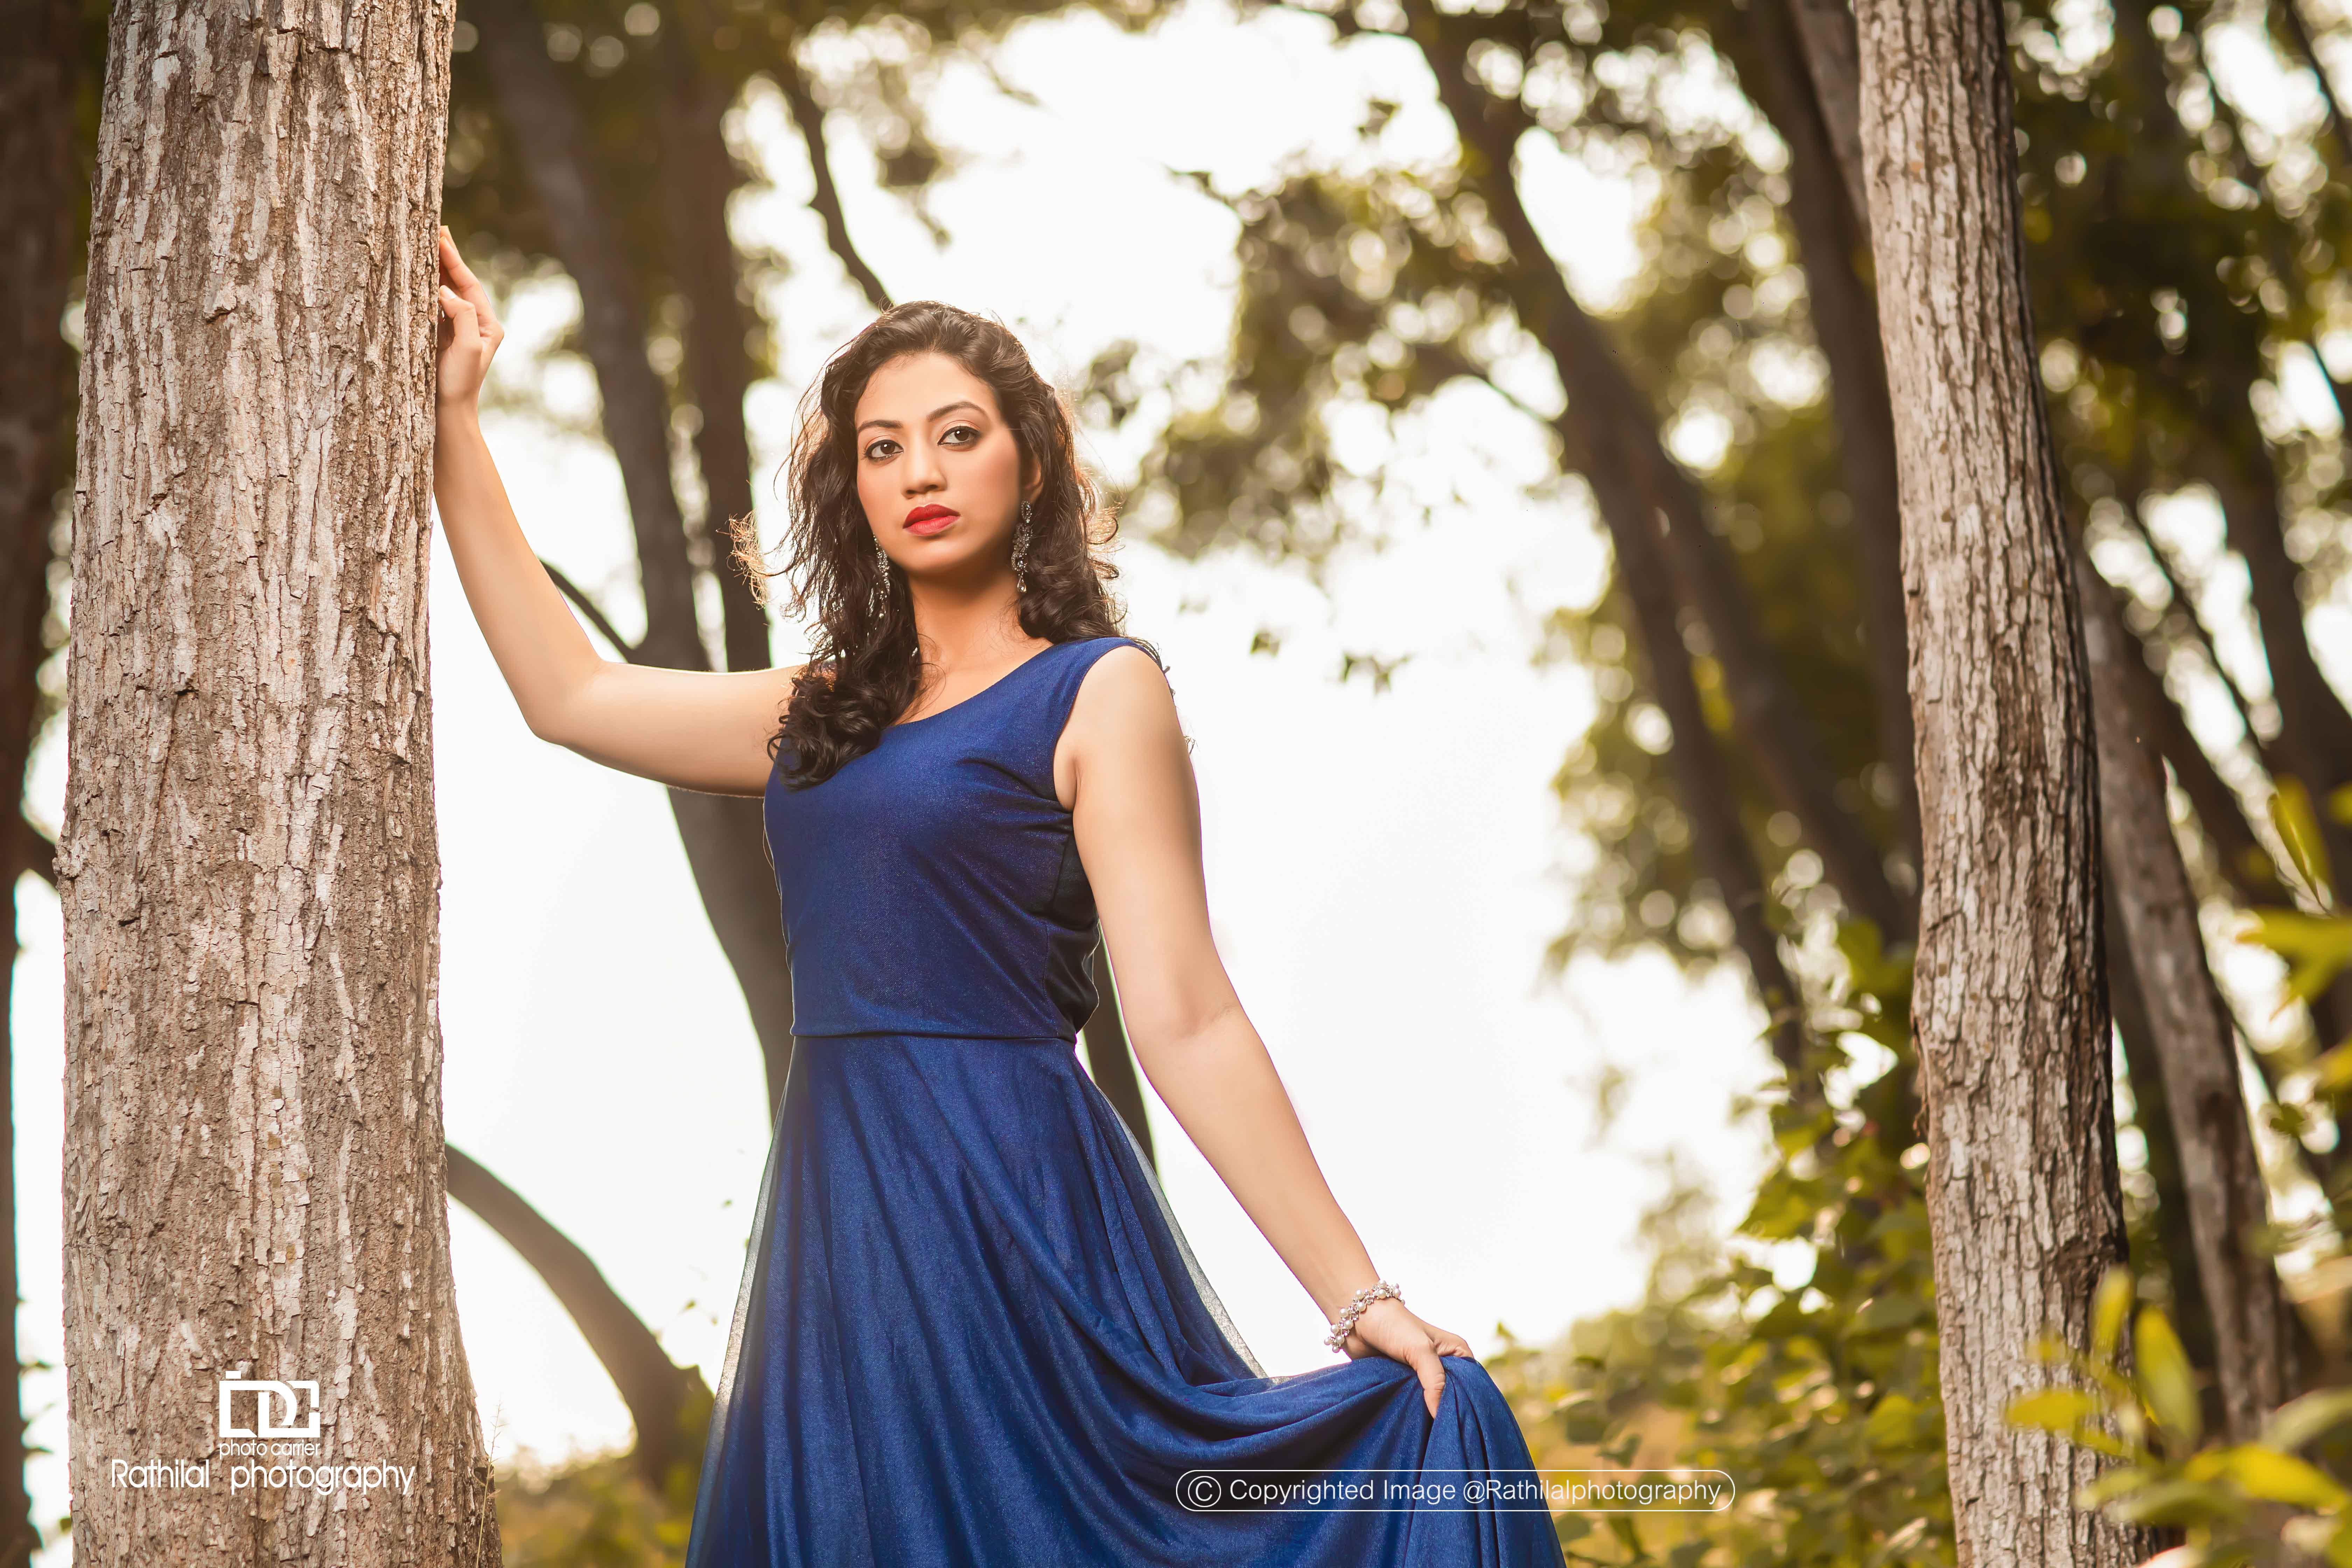 Irene jose Portfolio Photoshoot By Rathilalphotography